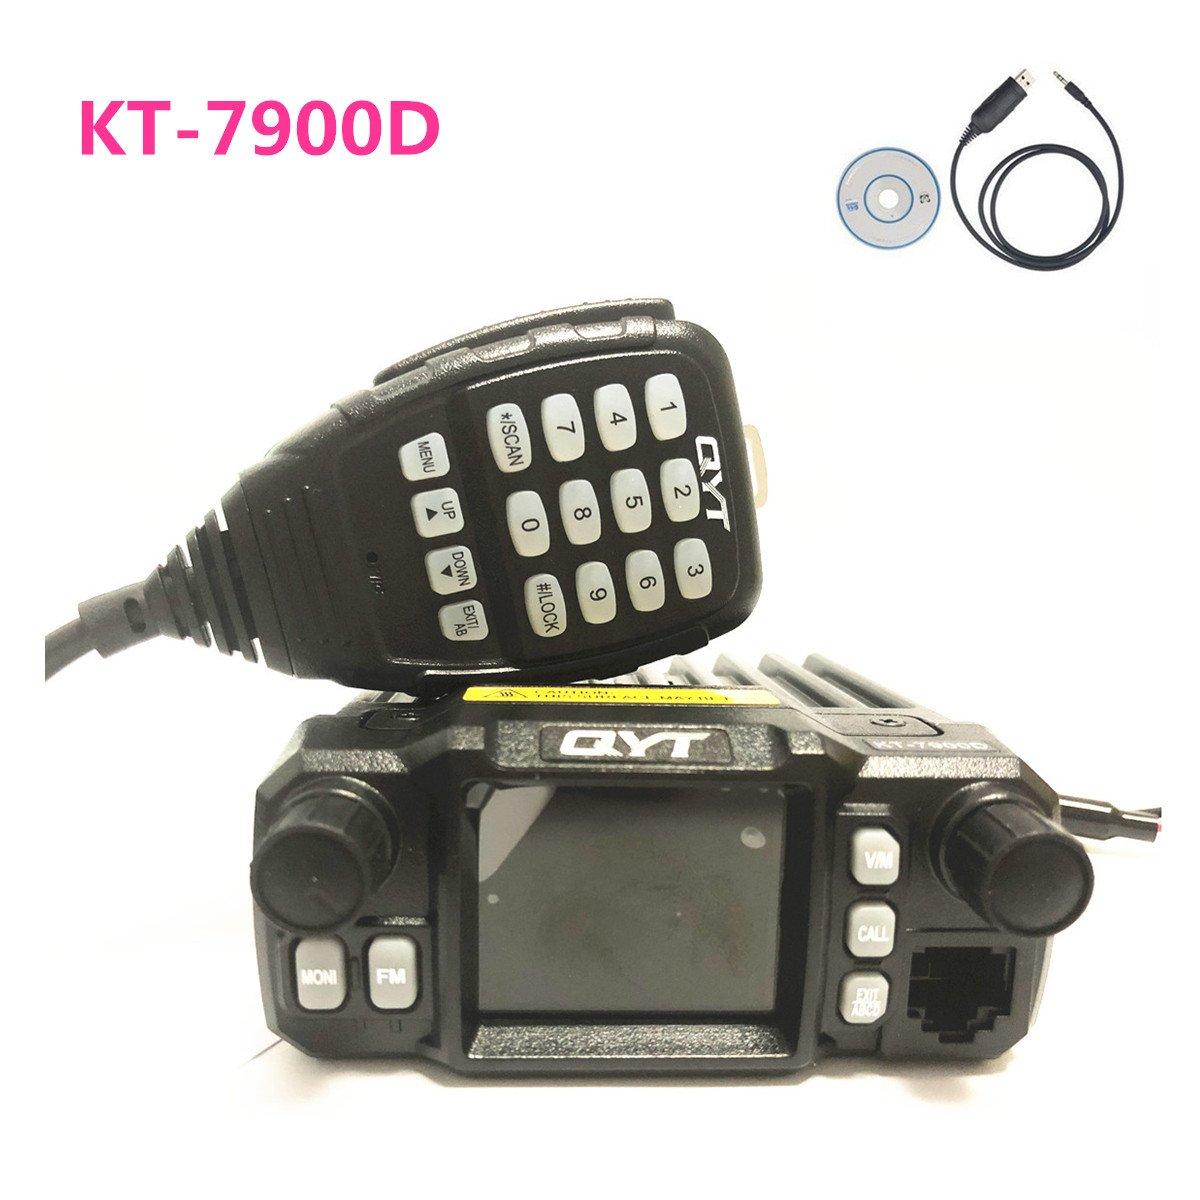 QYT KT-7900D Quad Band Mobile Radio 136-174/220-270/350-390/400-480mhz Quad Standby Amateur (HAM) Radio